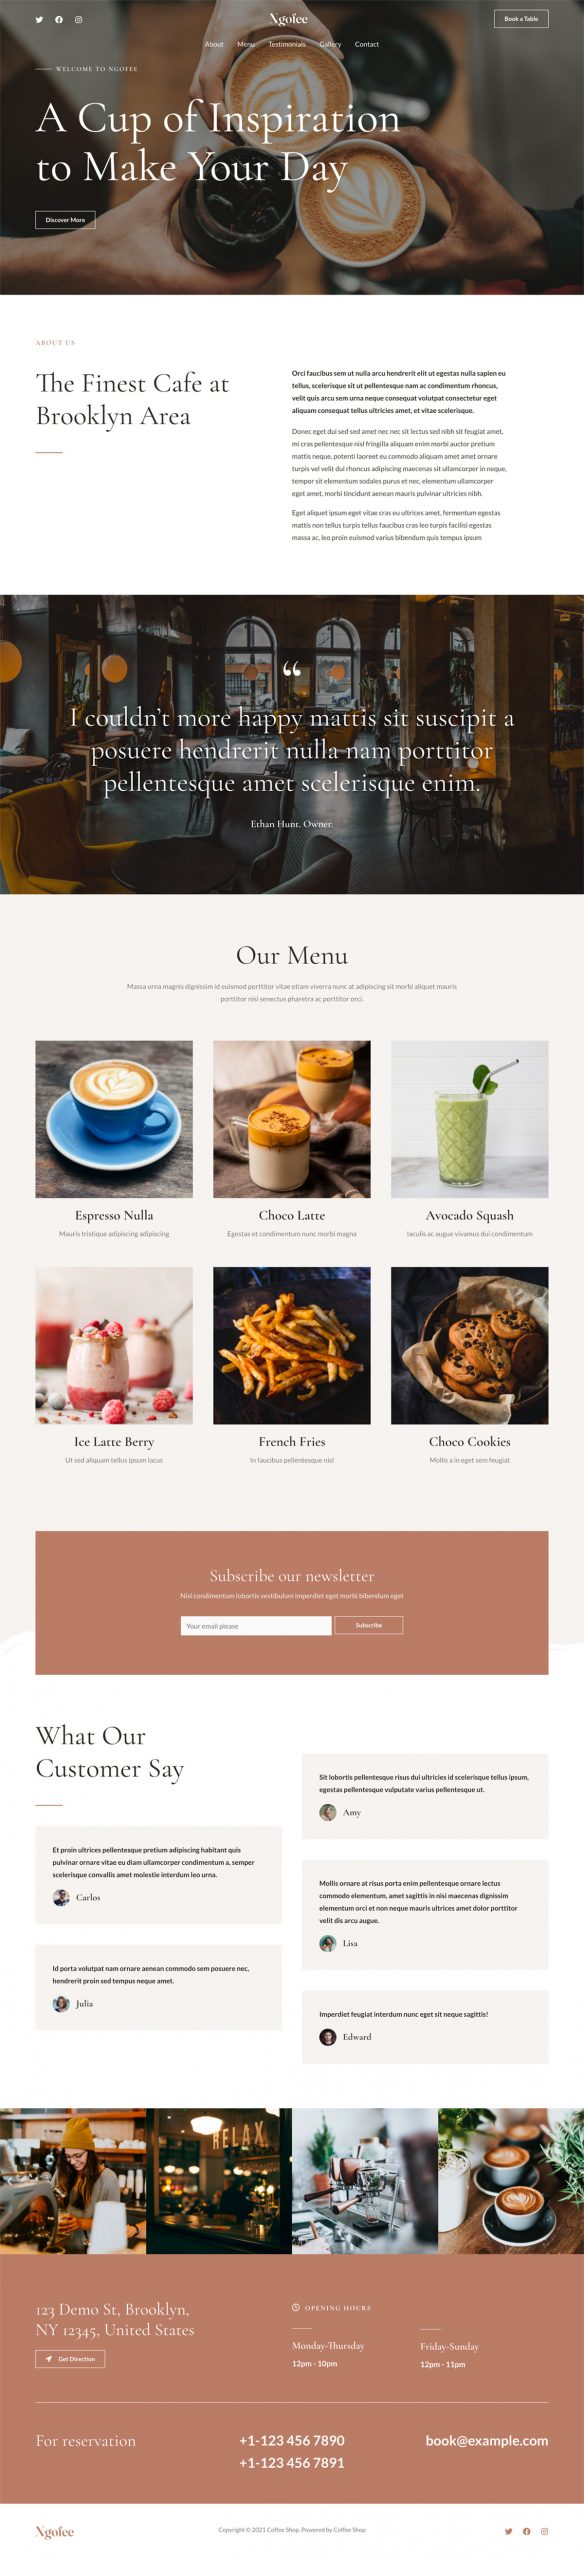 Adamo Web Design | Web Design Durham | coffee shop 02 scaled